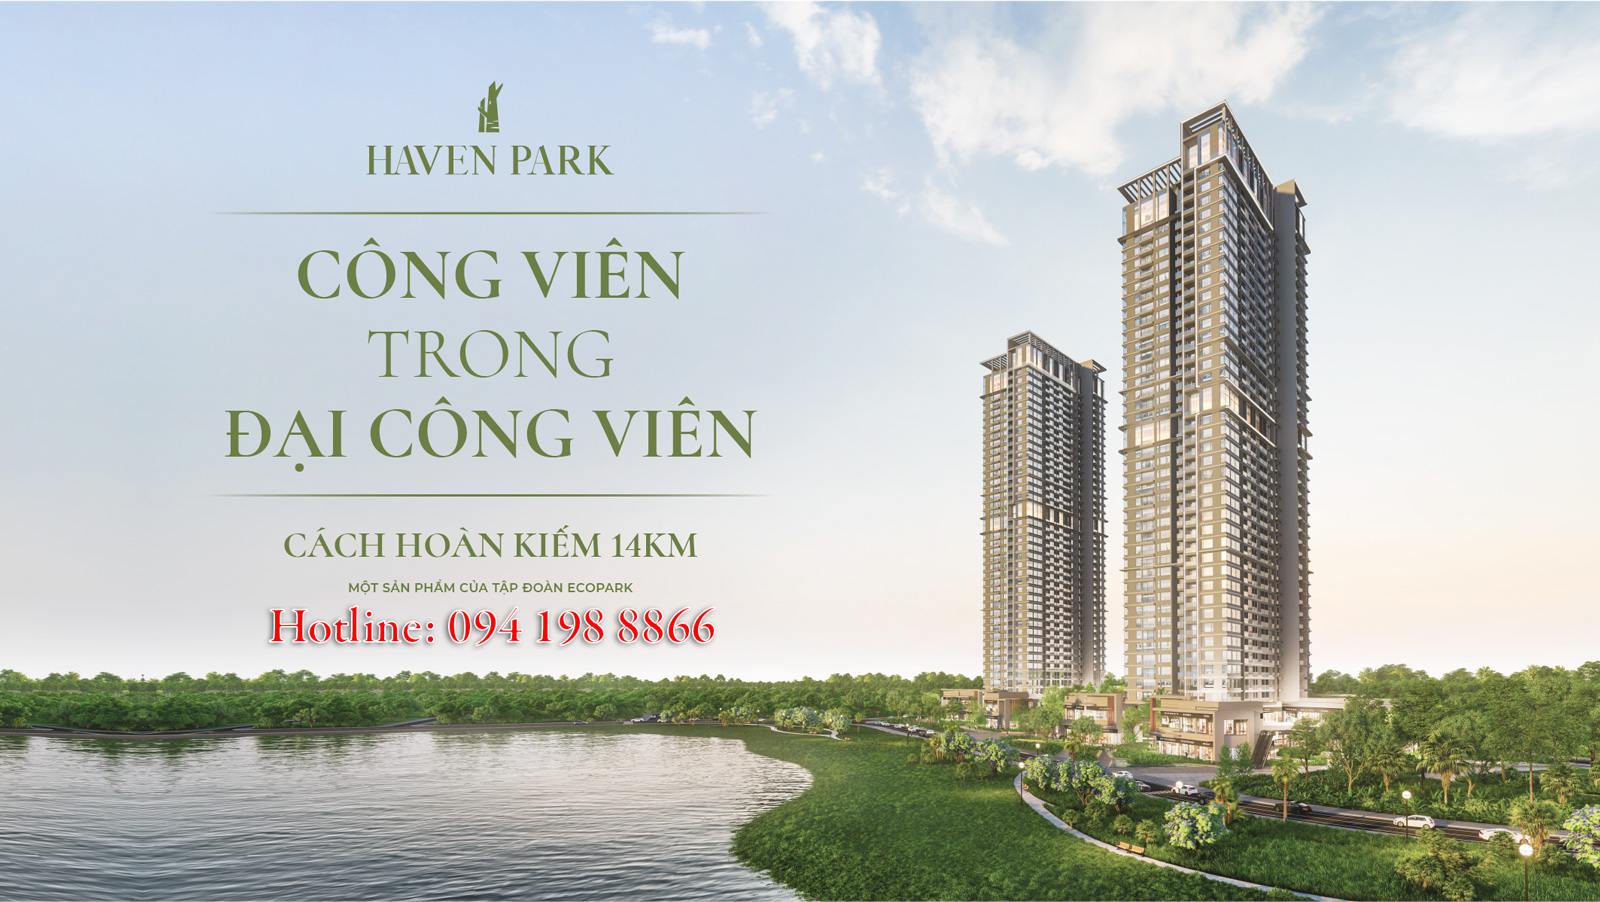 Chung cư Haven Park Residences